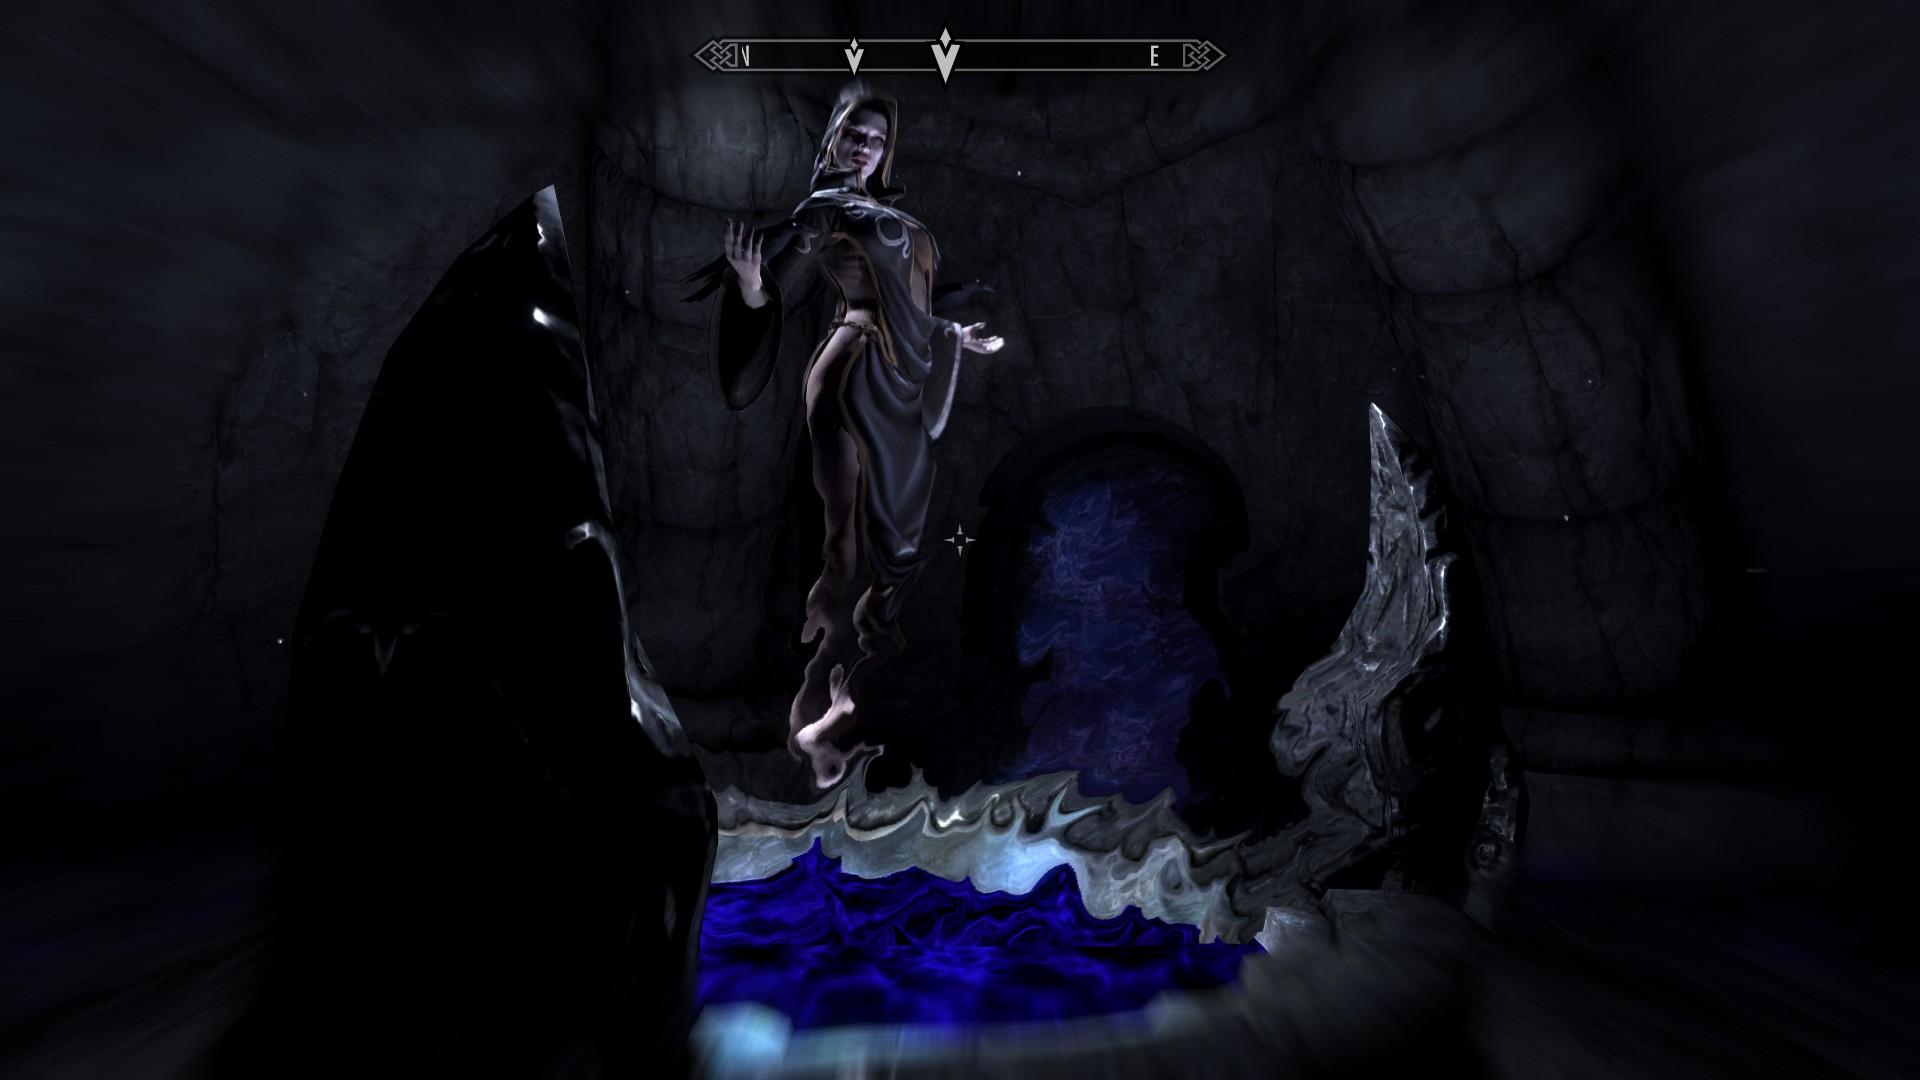 20180616152902_1.jpg - Elder Scrolls 5: Skyrim, the